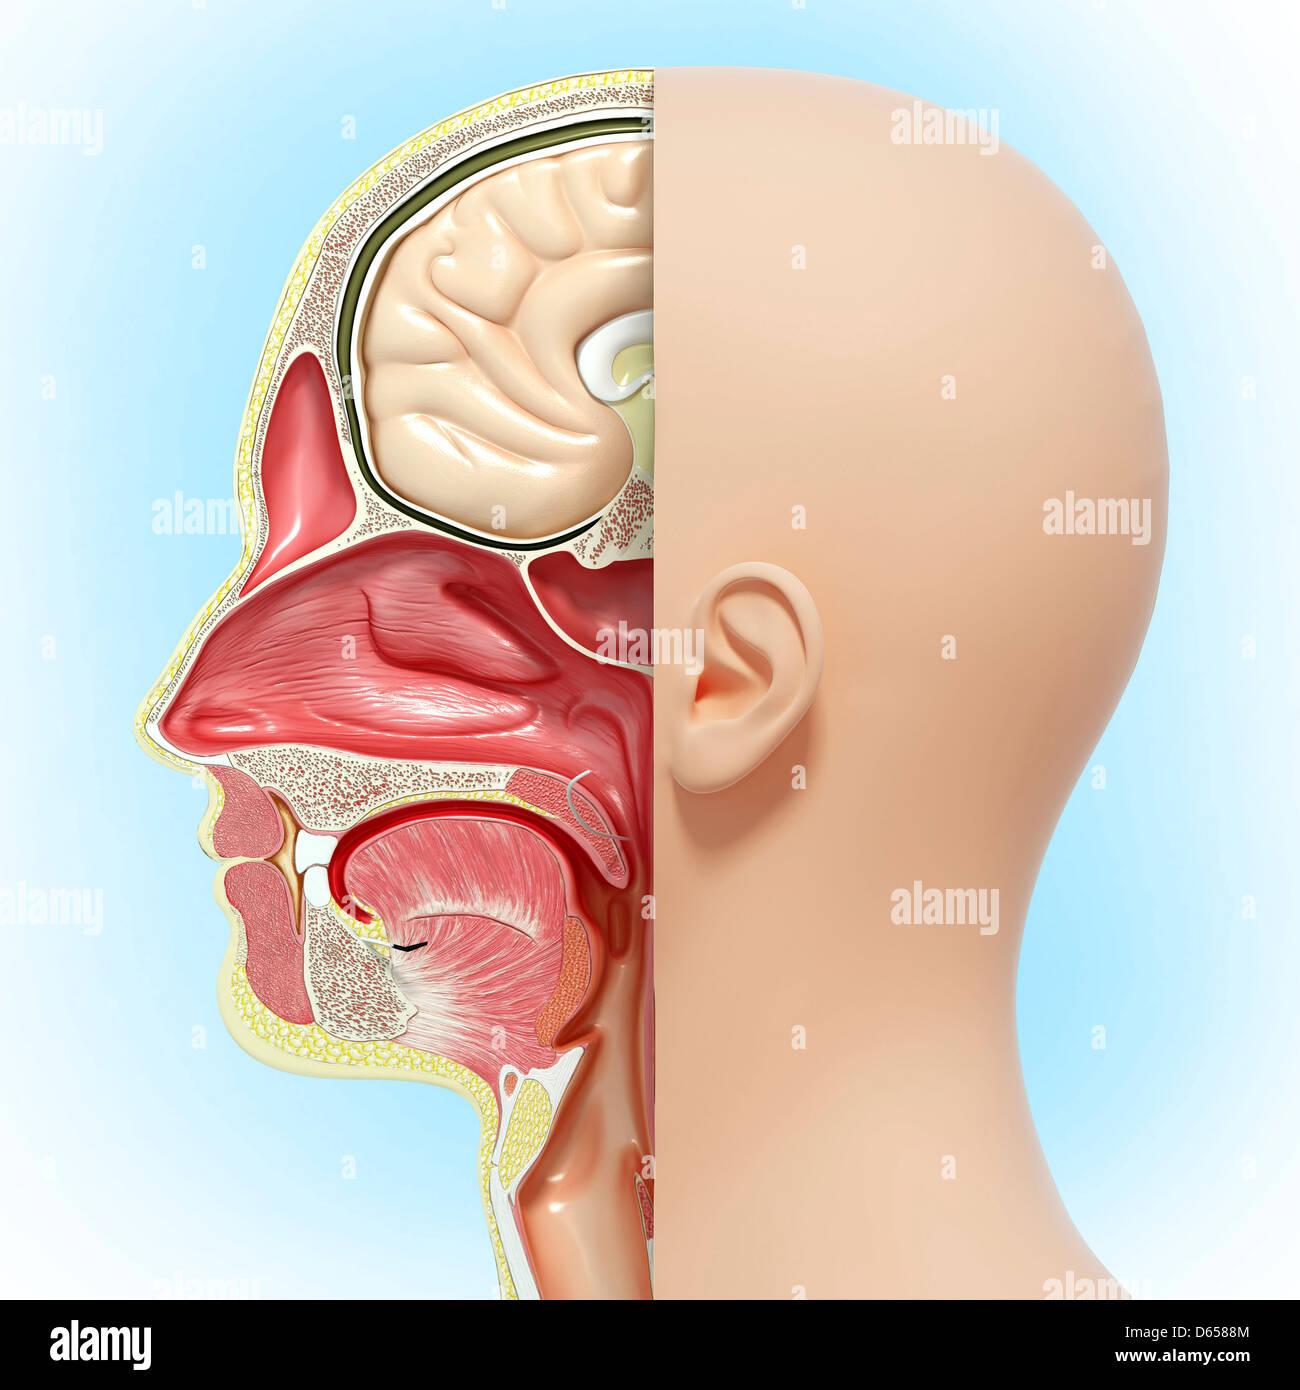 Human Ear Anatomy Stock Photos & Human Ear Anatomy Stock Images - Alamy